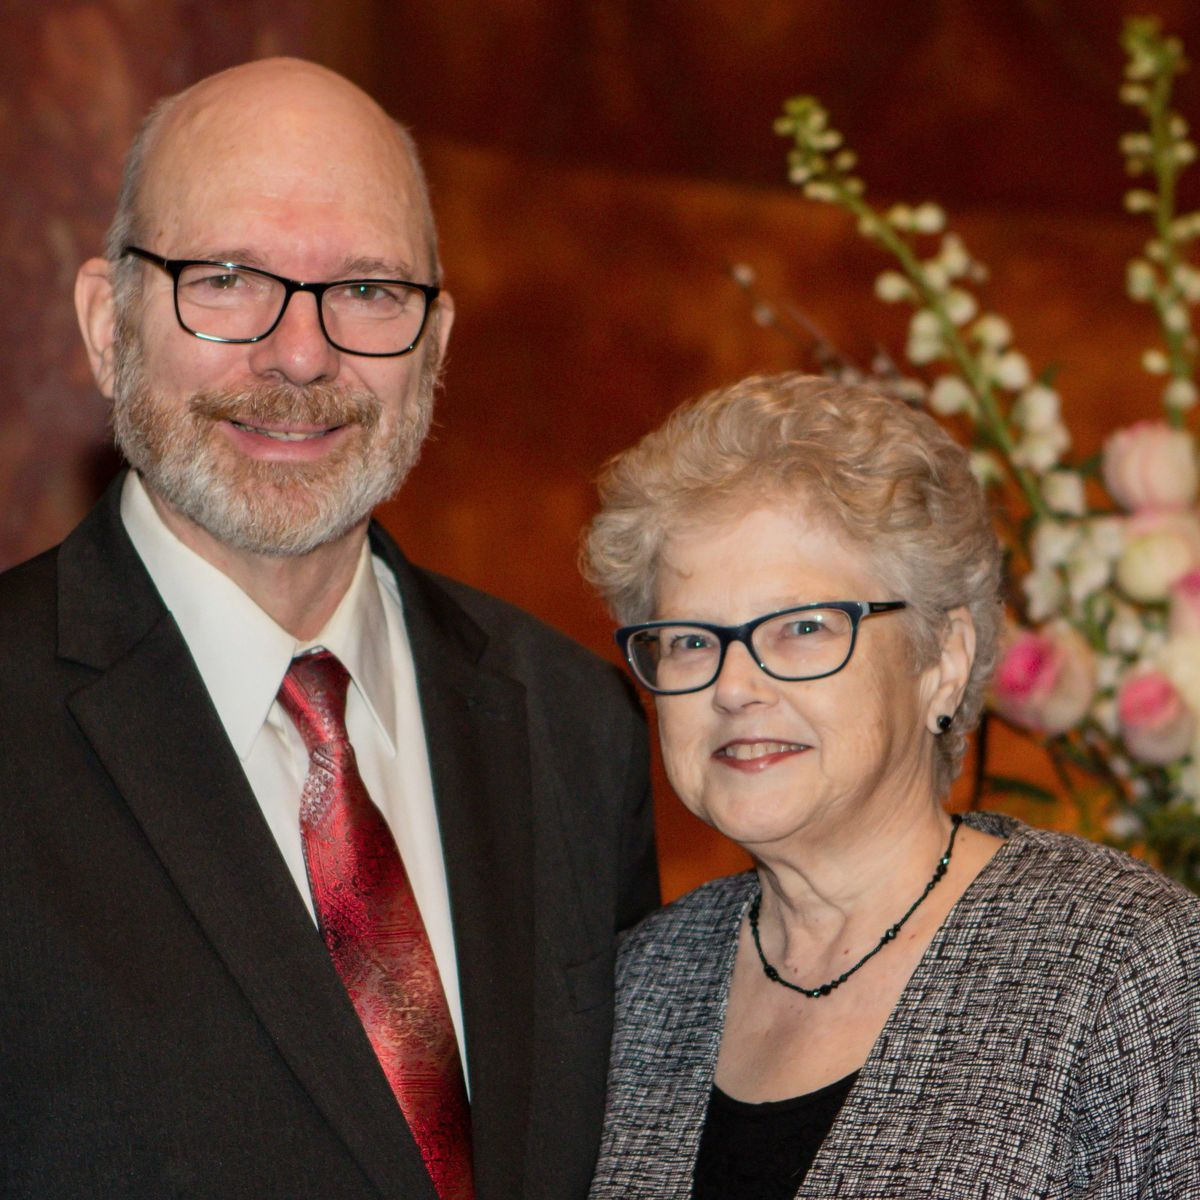 Minneapolis Wedding Officiants